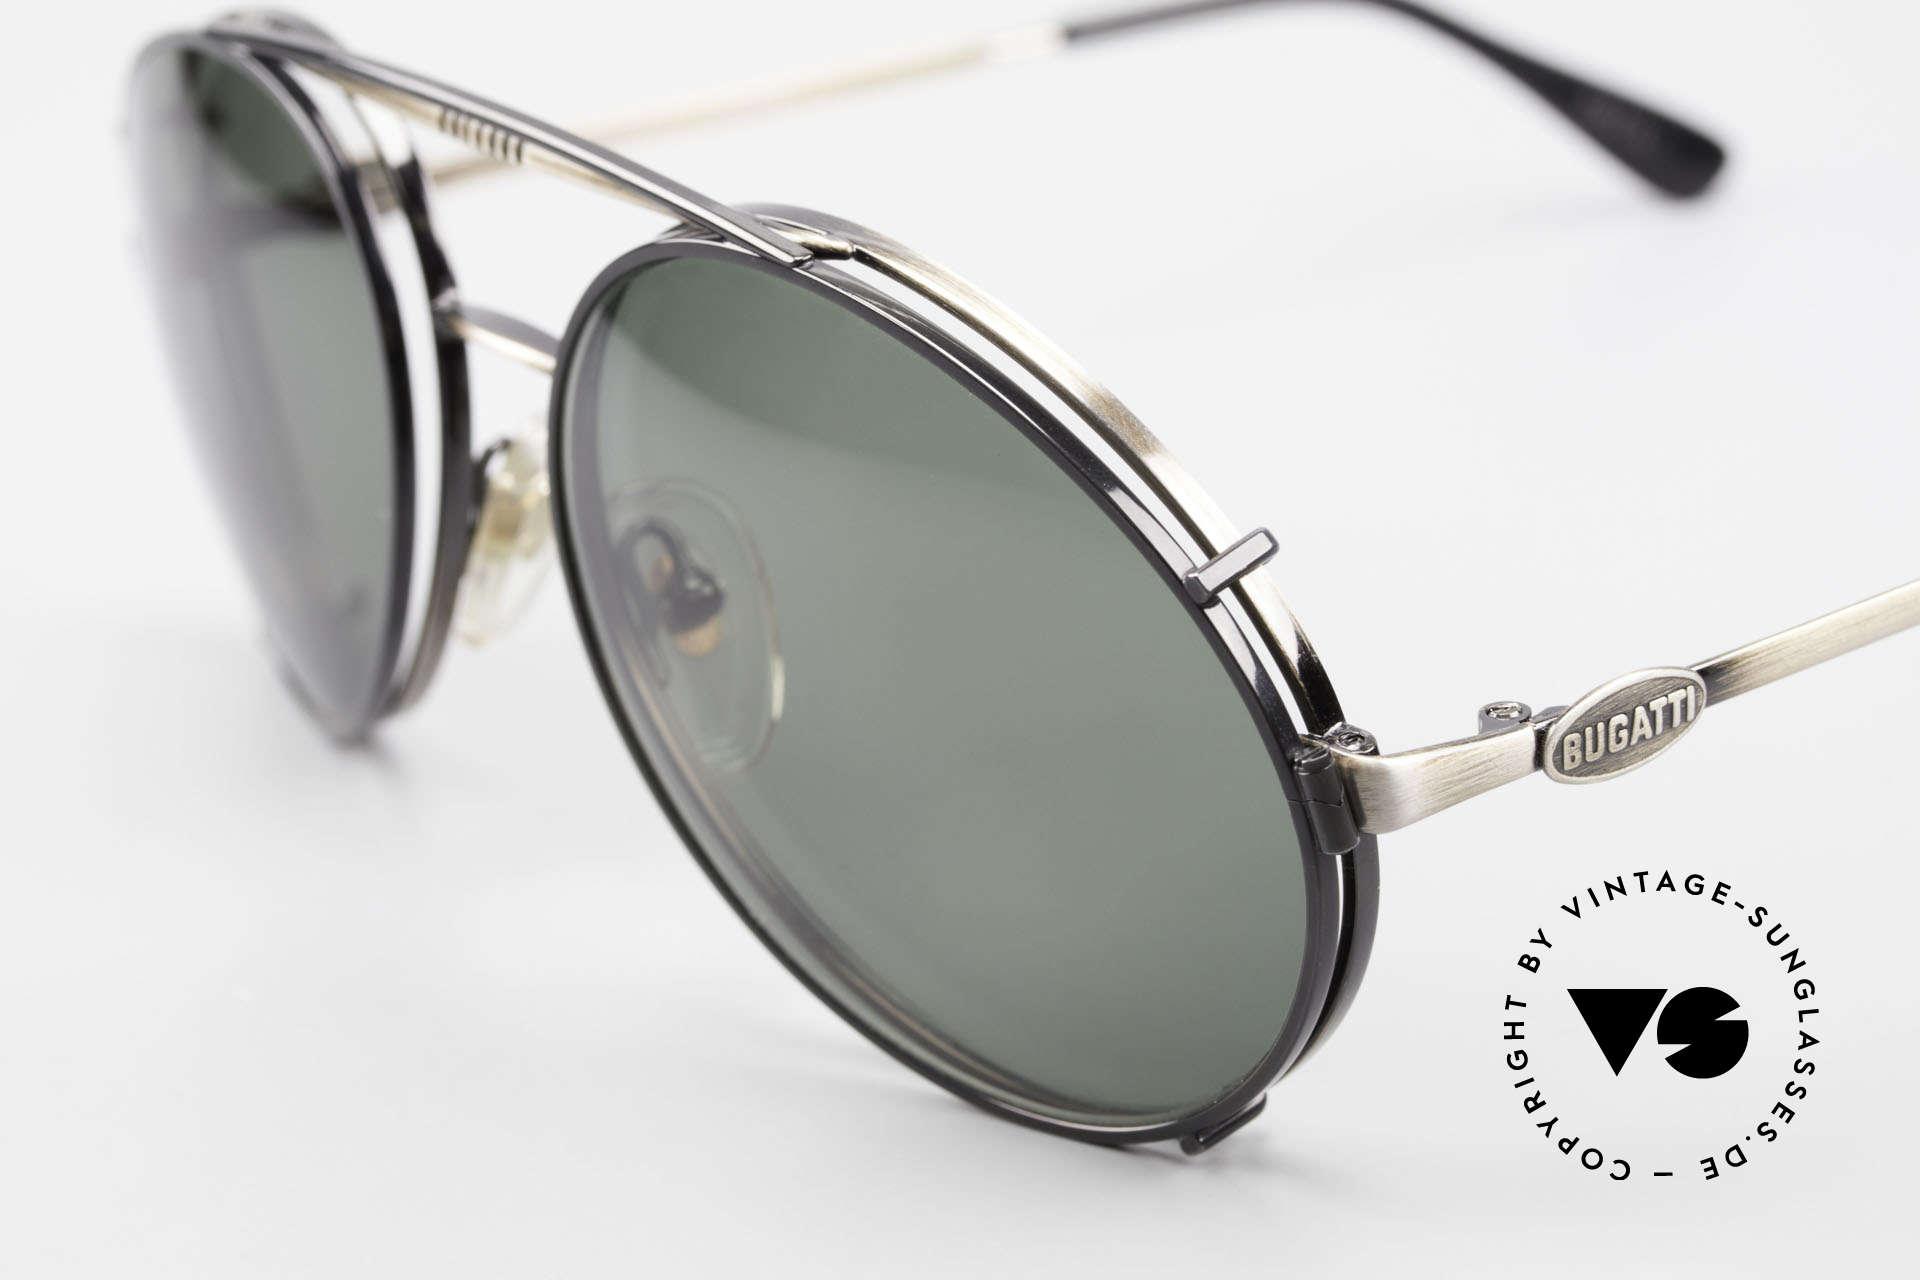 Bugatti 65282 Vintage Men's Glasses 1980's, remarkable finish (anthracite / antique metal), Made for Men